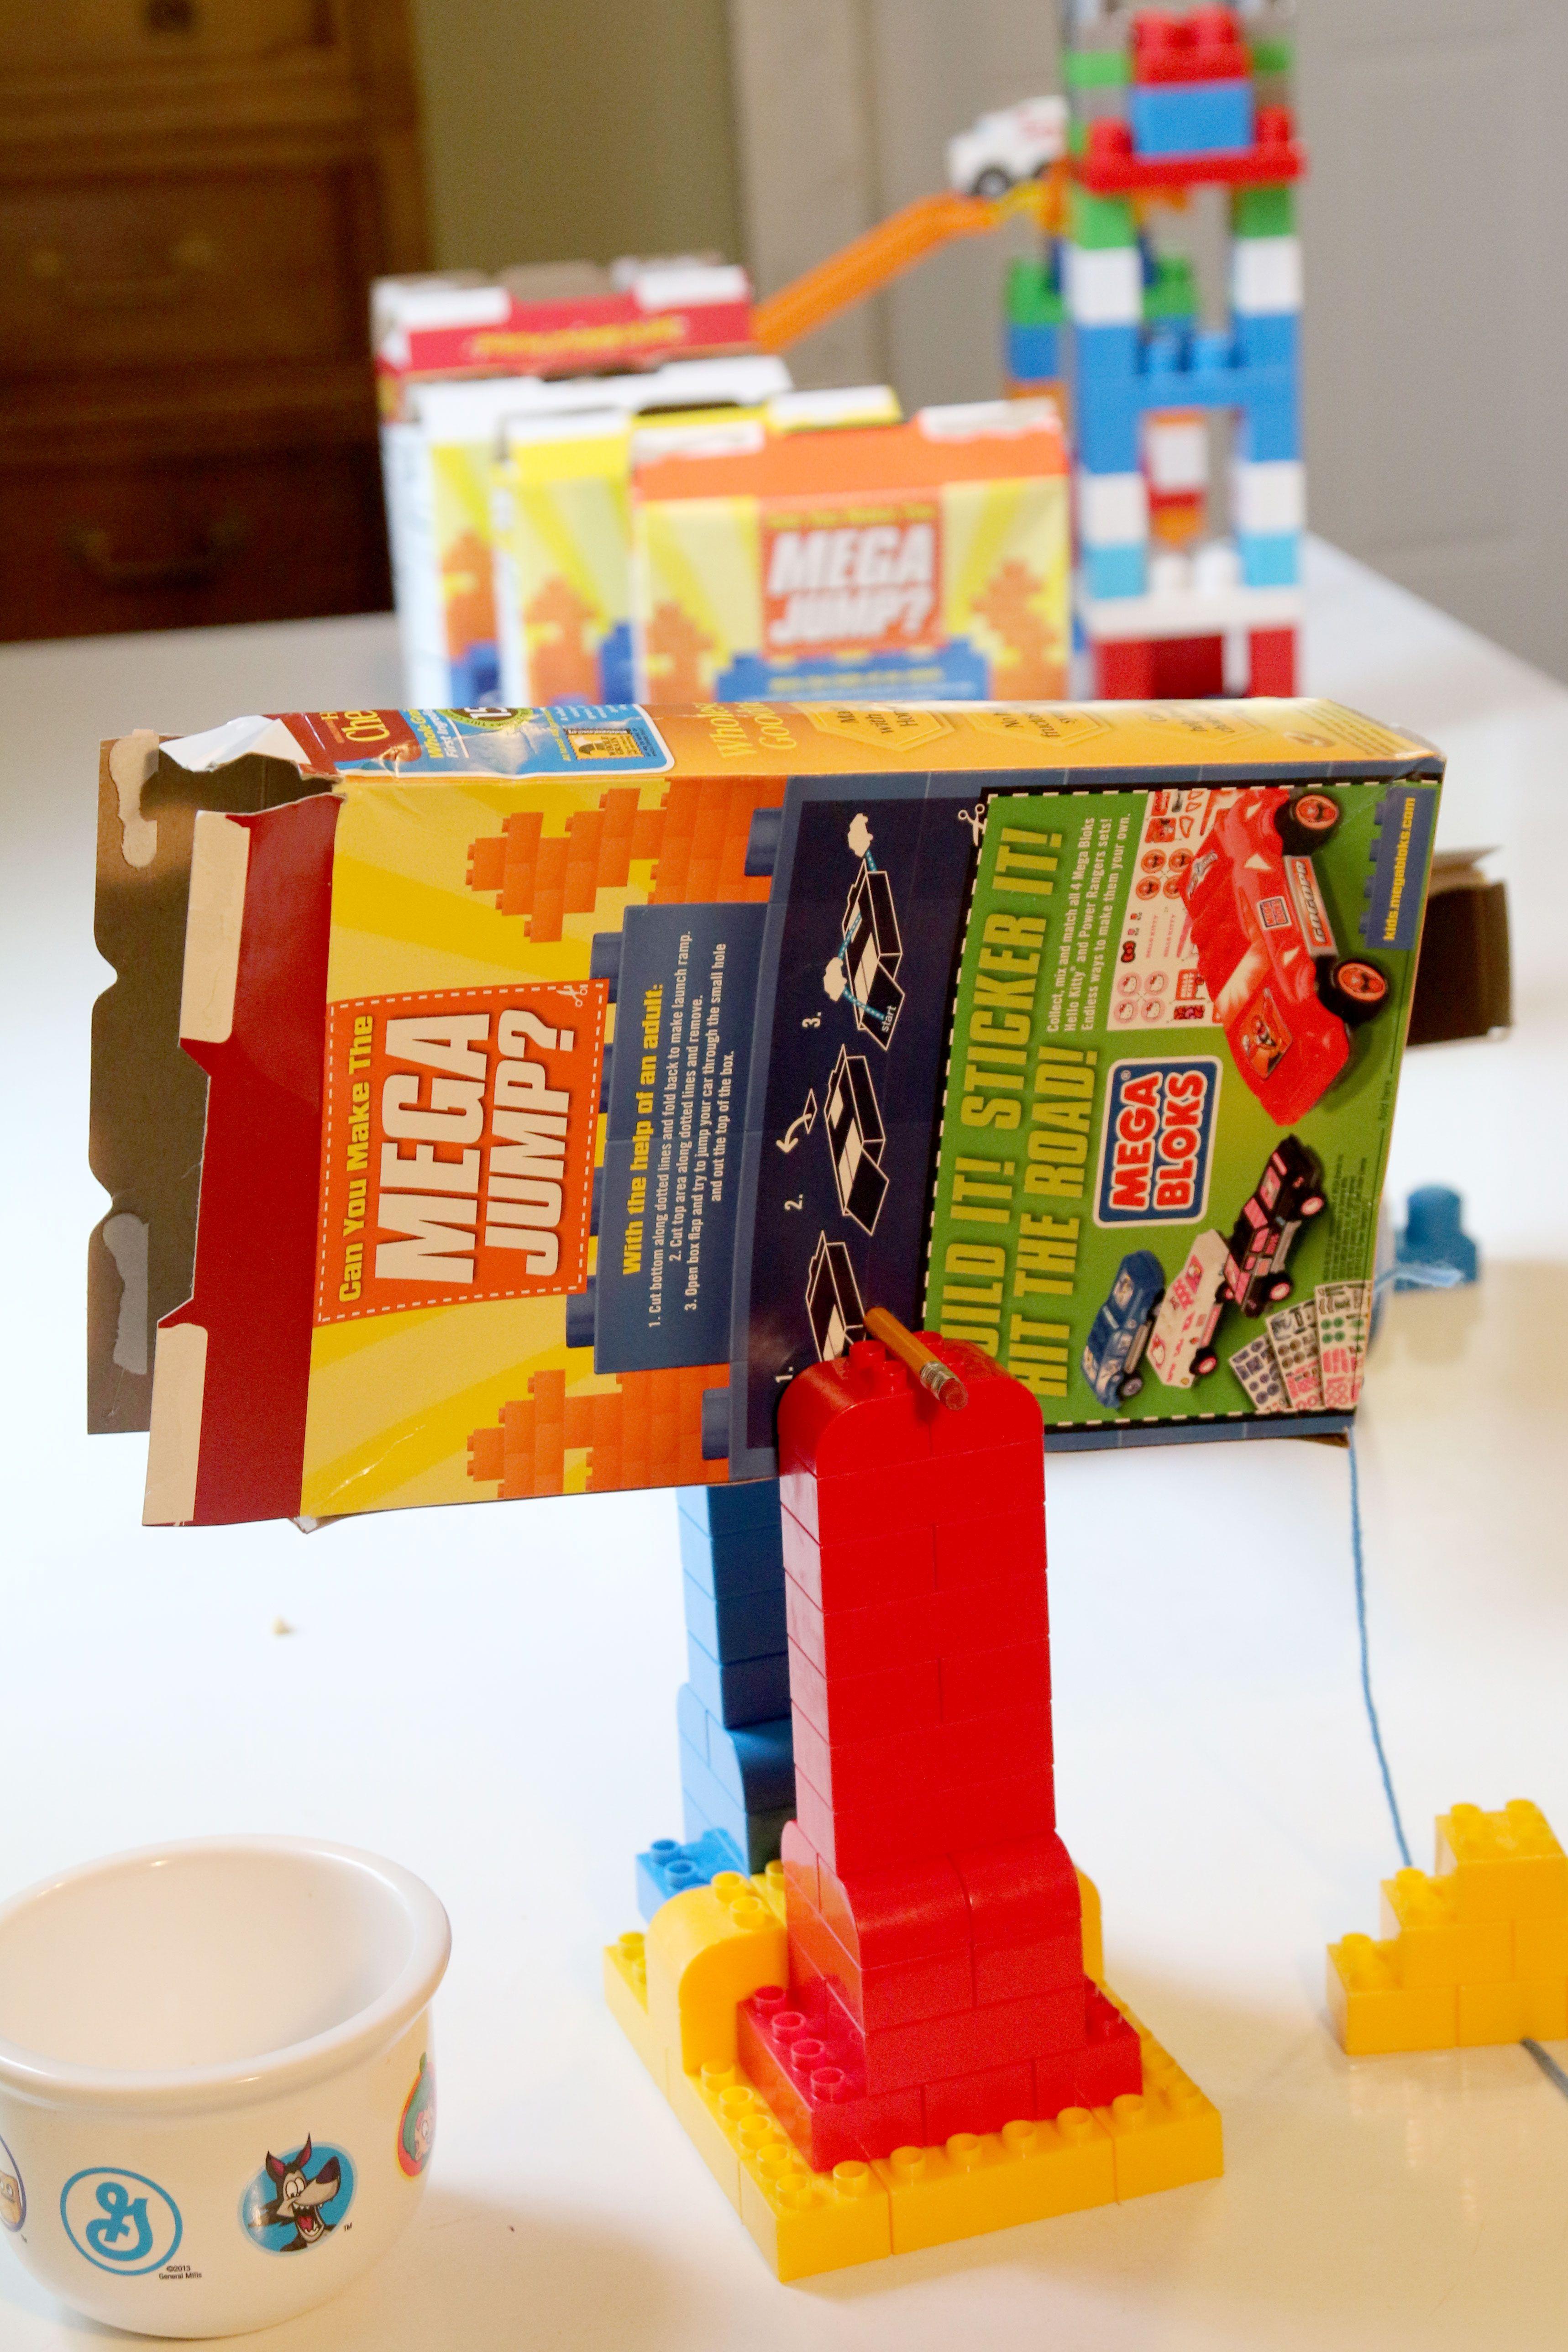 Rube Goldberg Machine To Pour Cereal